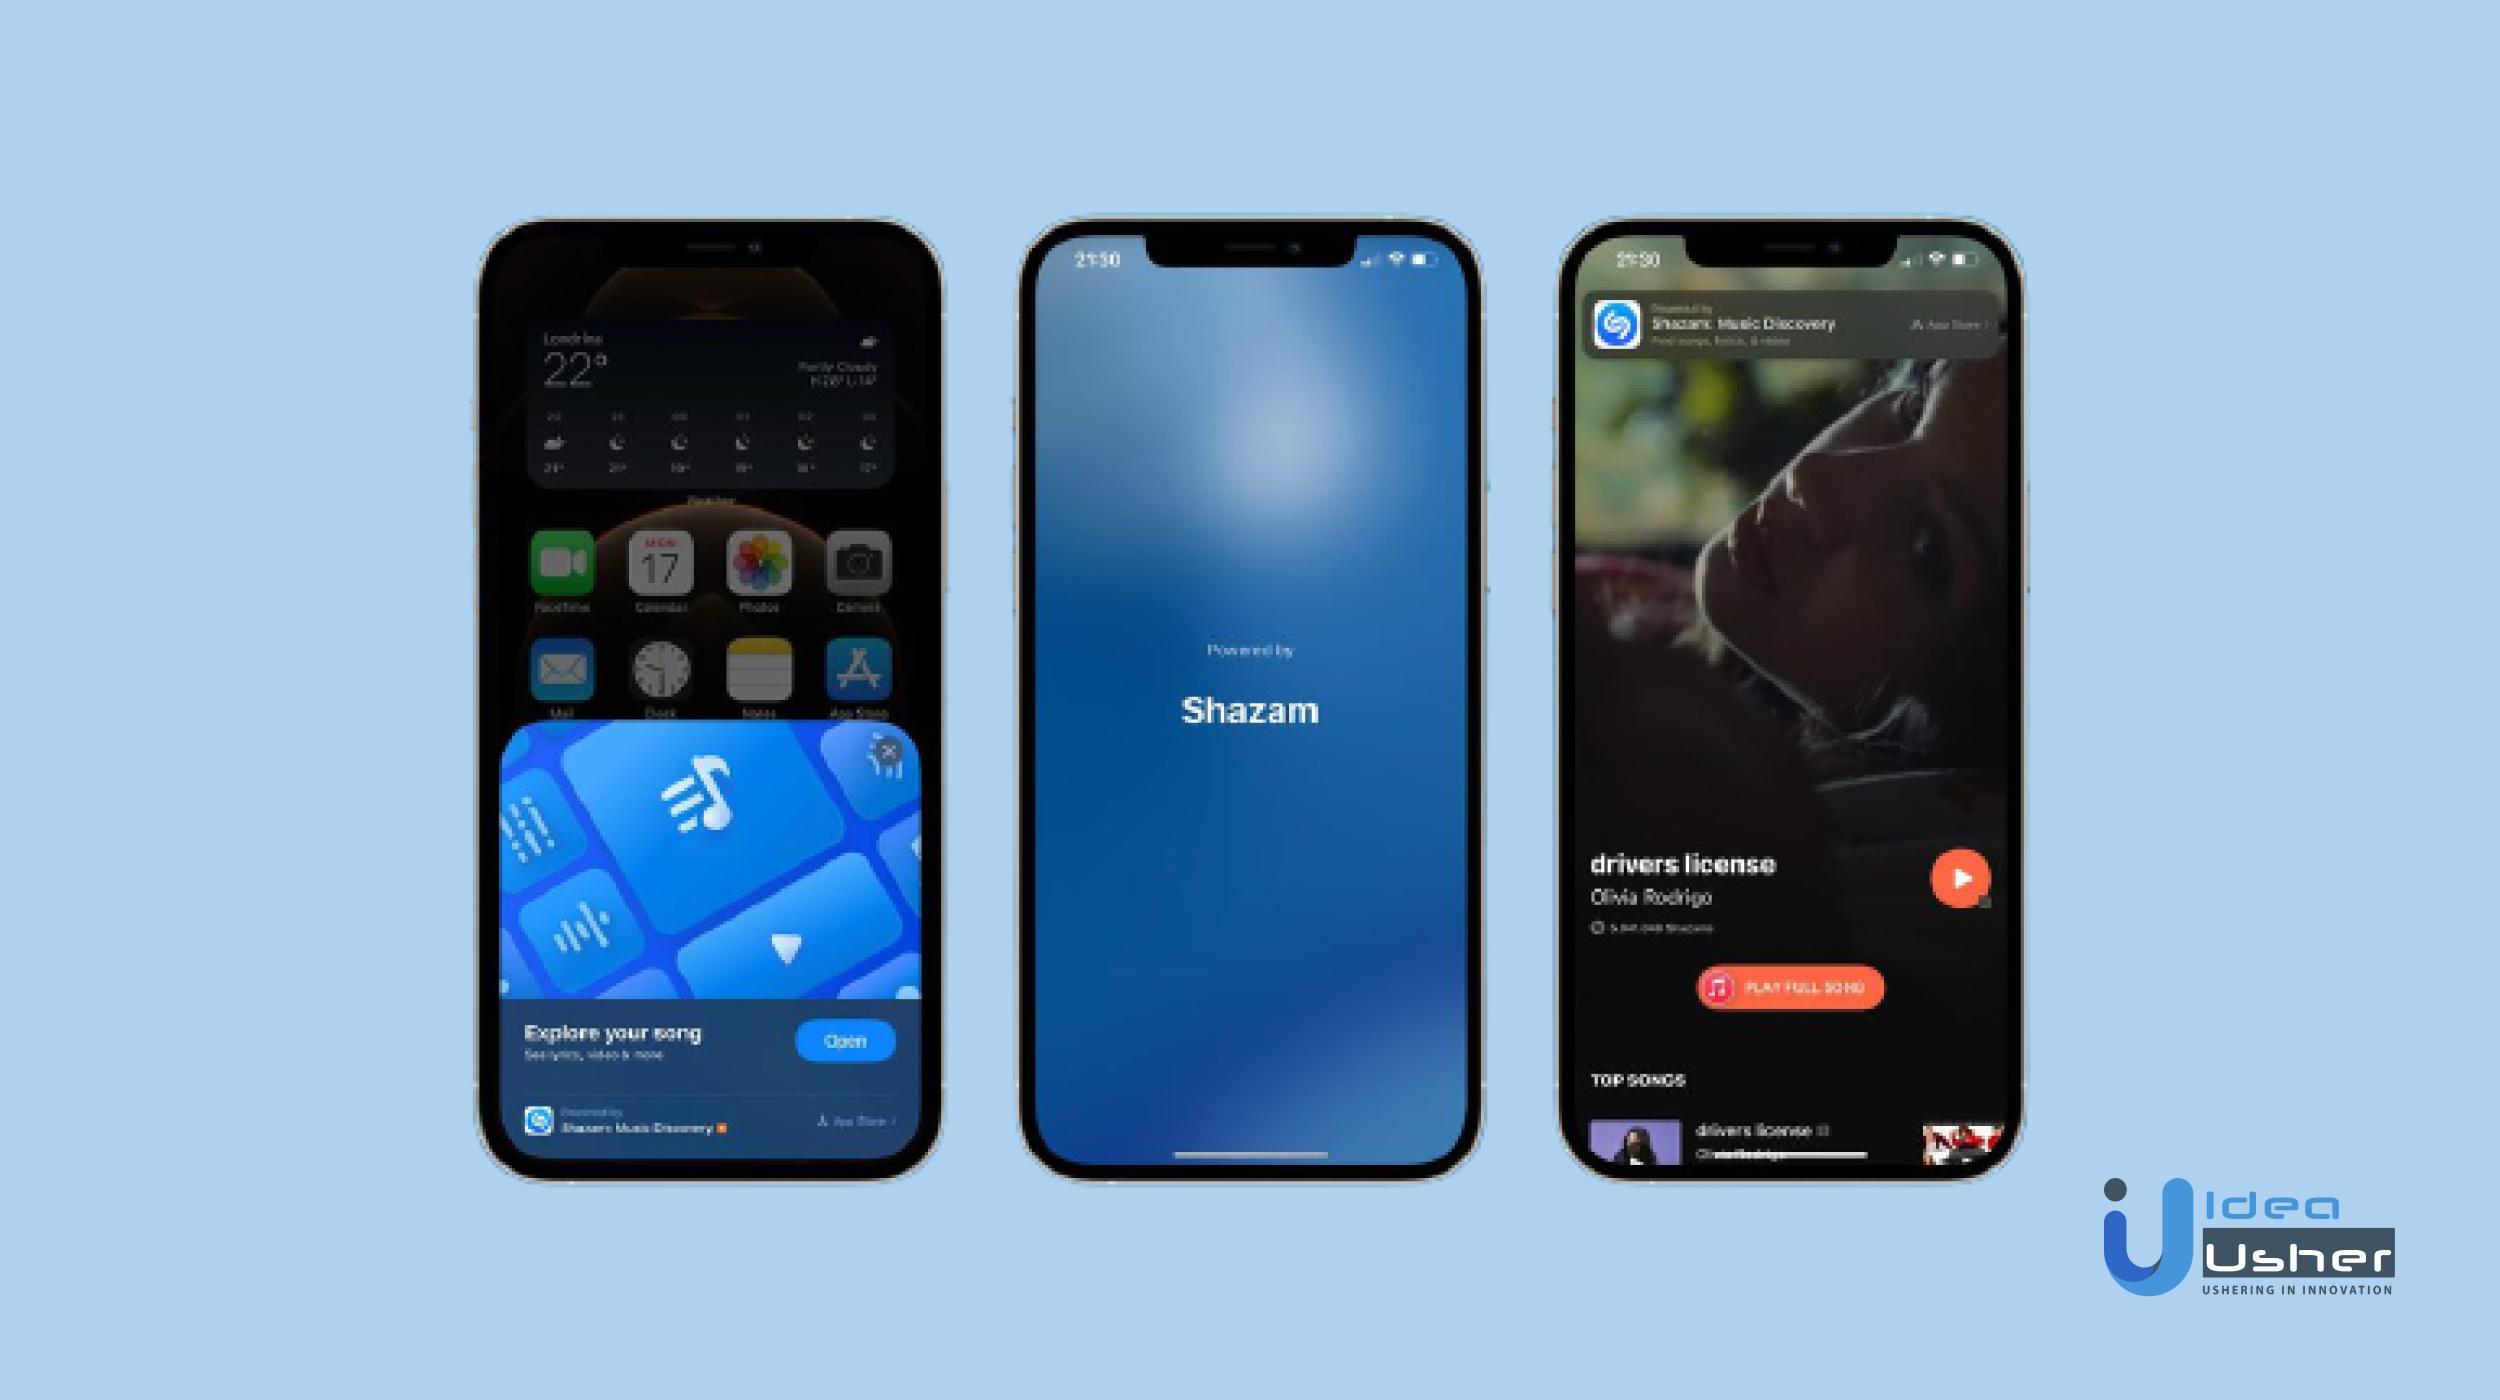 how to create an app like Shazam